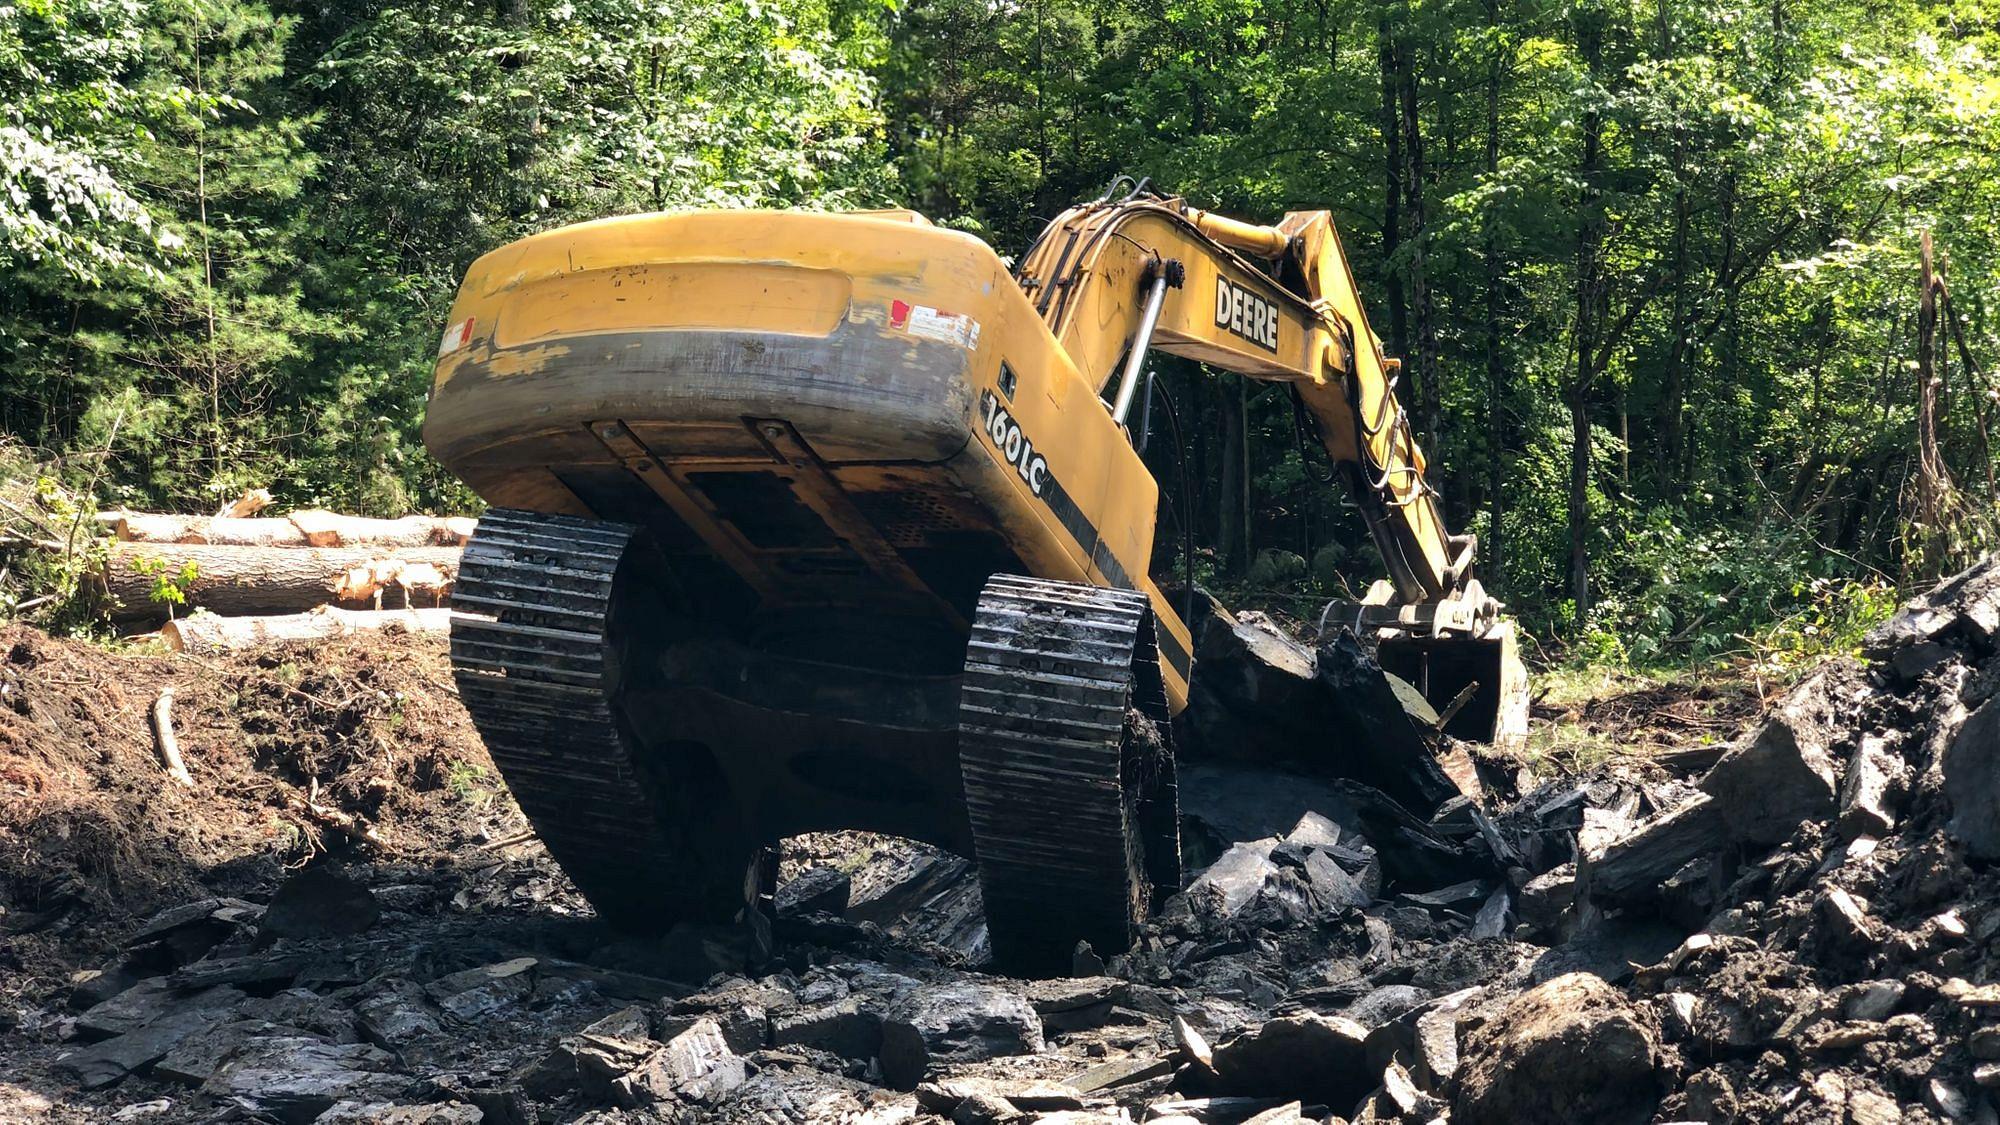 Excavator Removing Bedrock